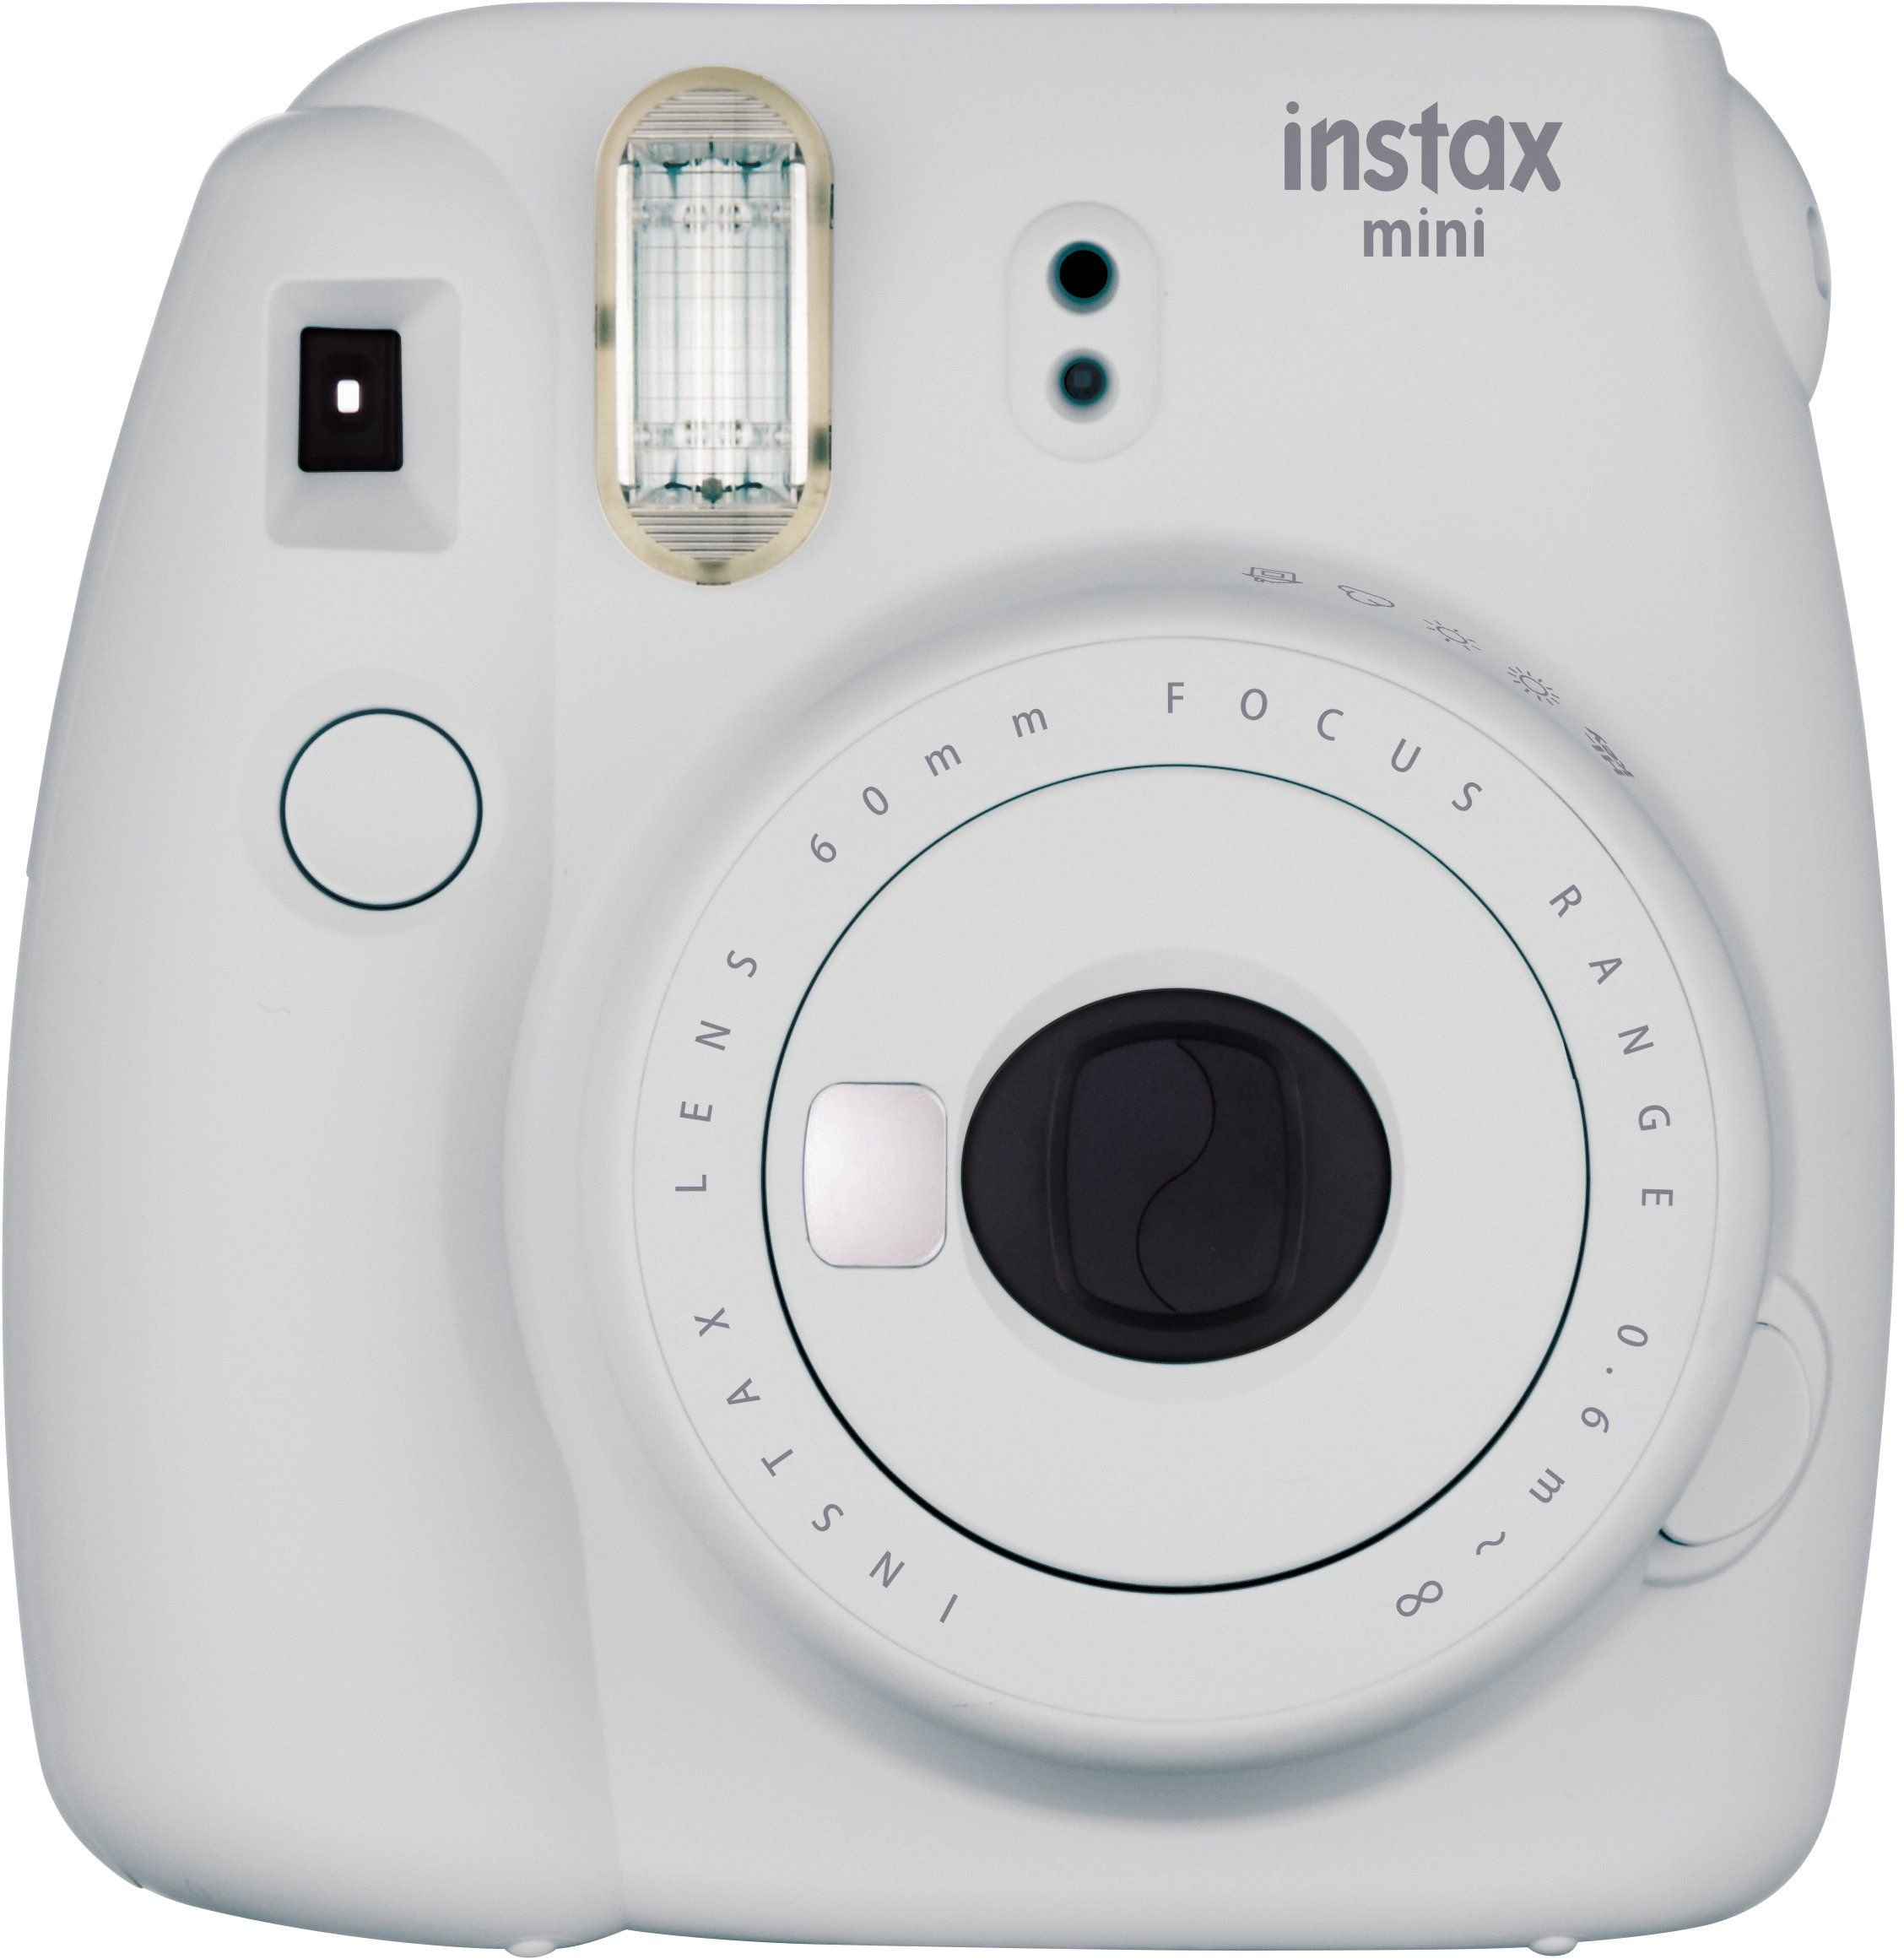 Fujifilm Instax Mini 9 Instant Camera - Smokey White by Fujifilm